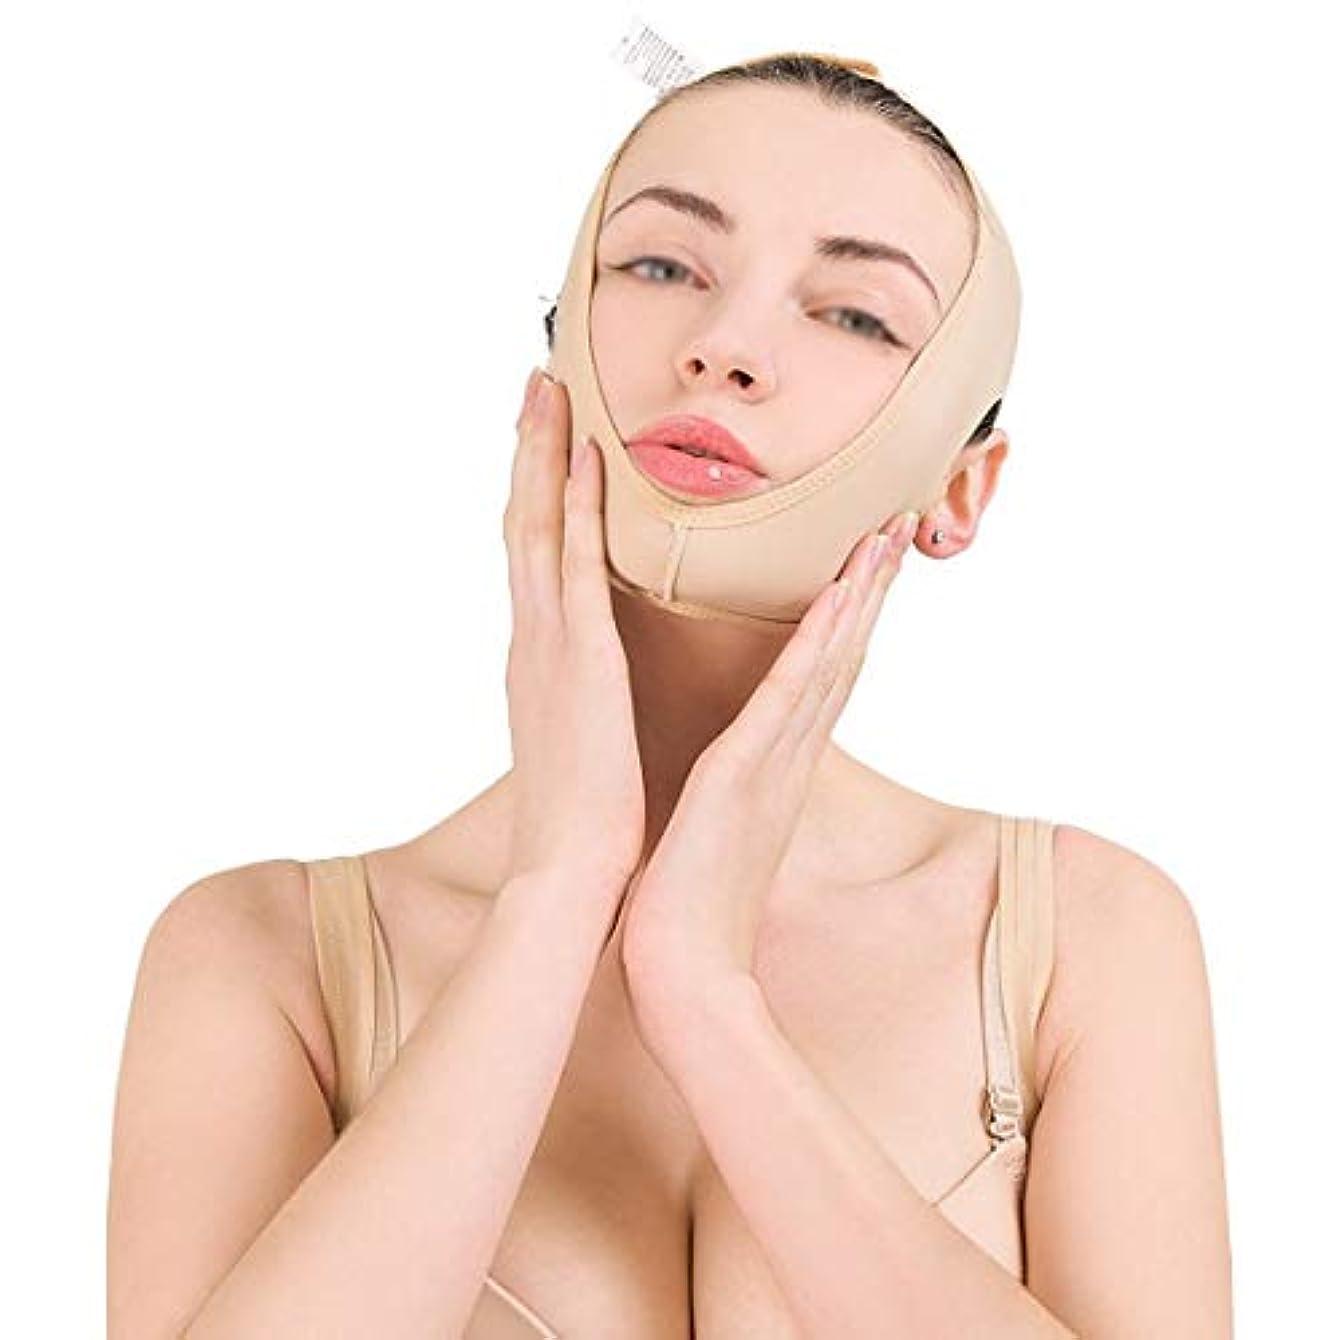 ZWBD フェイスマスク, フェイスリフティング包帯フェイシャルリフティング痩身Vリダクションフェイスダブルチンケア減量美容ベルト (Size : XL)